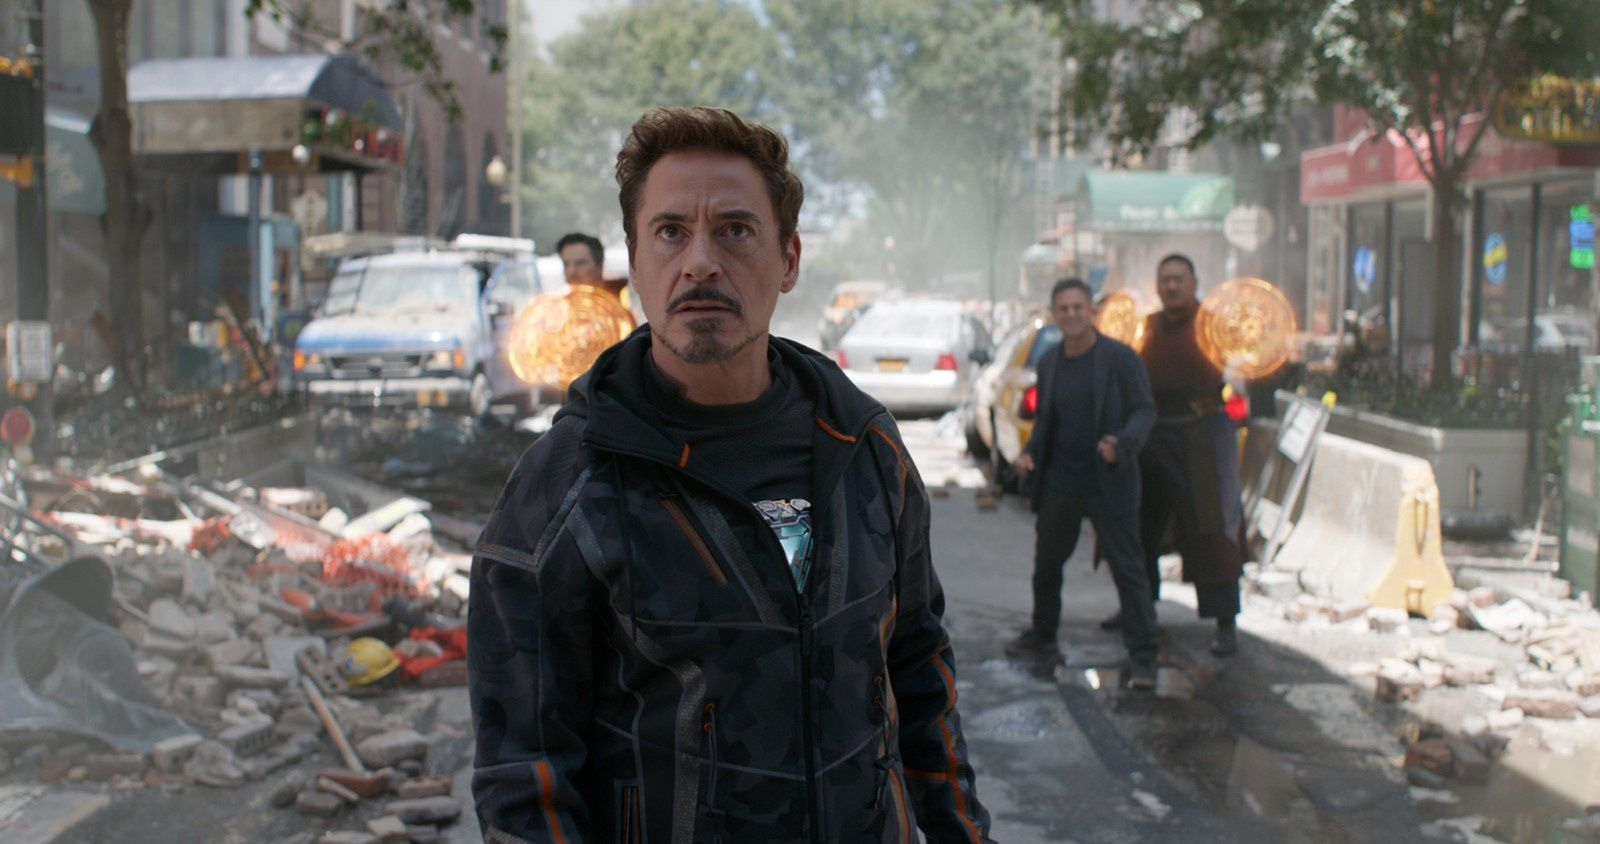 Avengers : Infinity War (BANDE-ANNONCE) avec Robert Downey Jr., Chris Hemsworth, Mark Ruffalo - Le 25 avril 2018 au cinéma